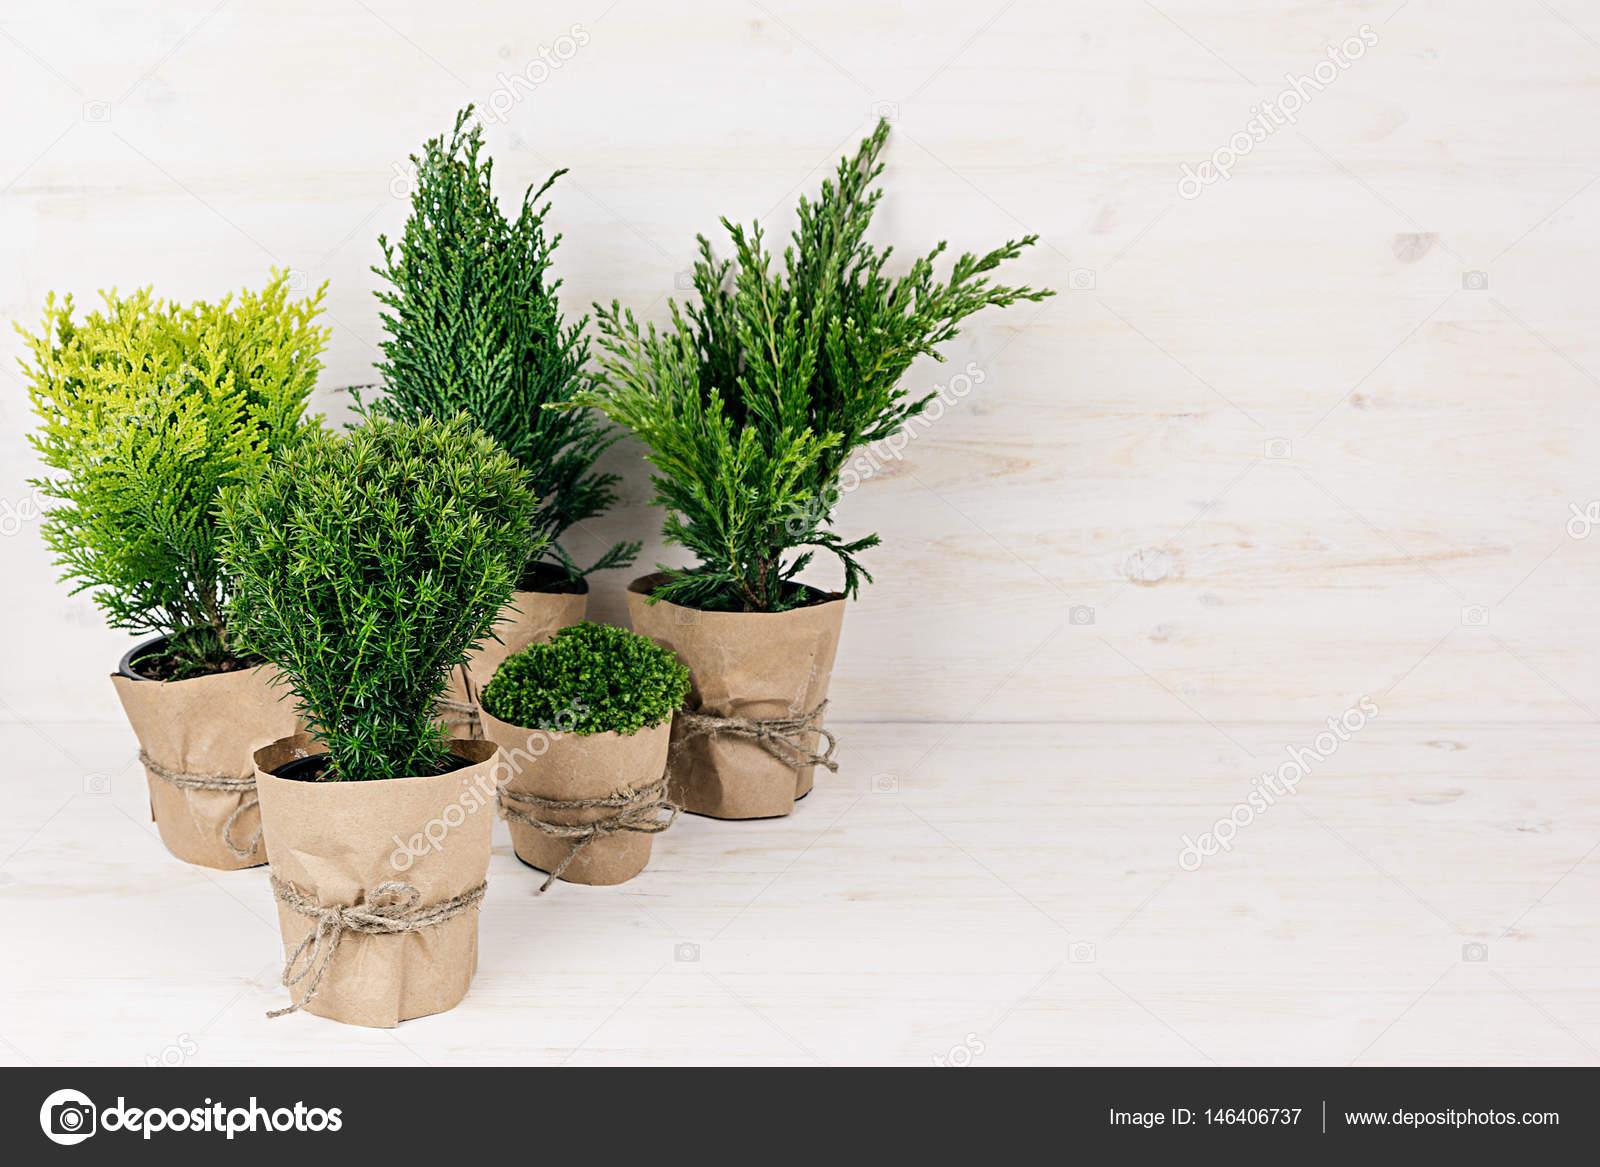 Piante arredamento moderno vasi moderni da interno con for Vasi arredamento moderno